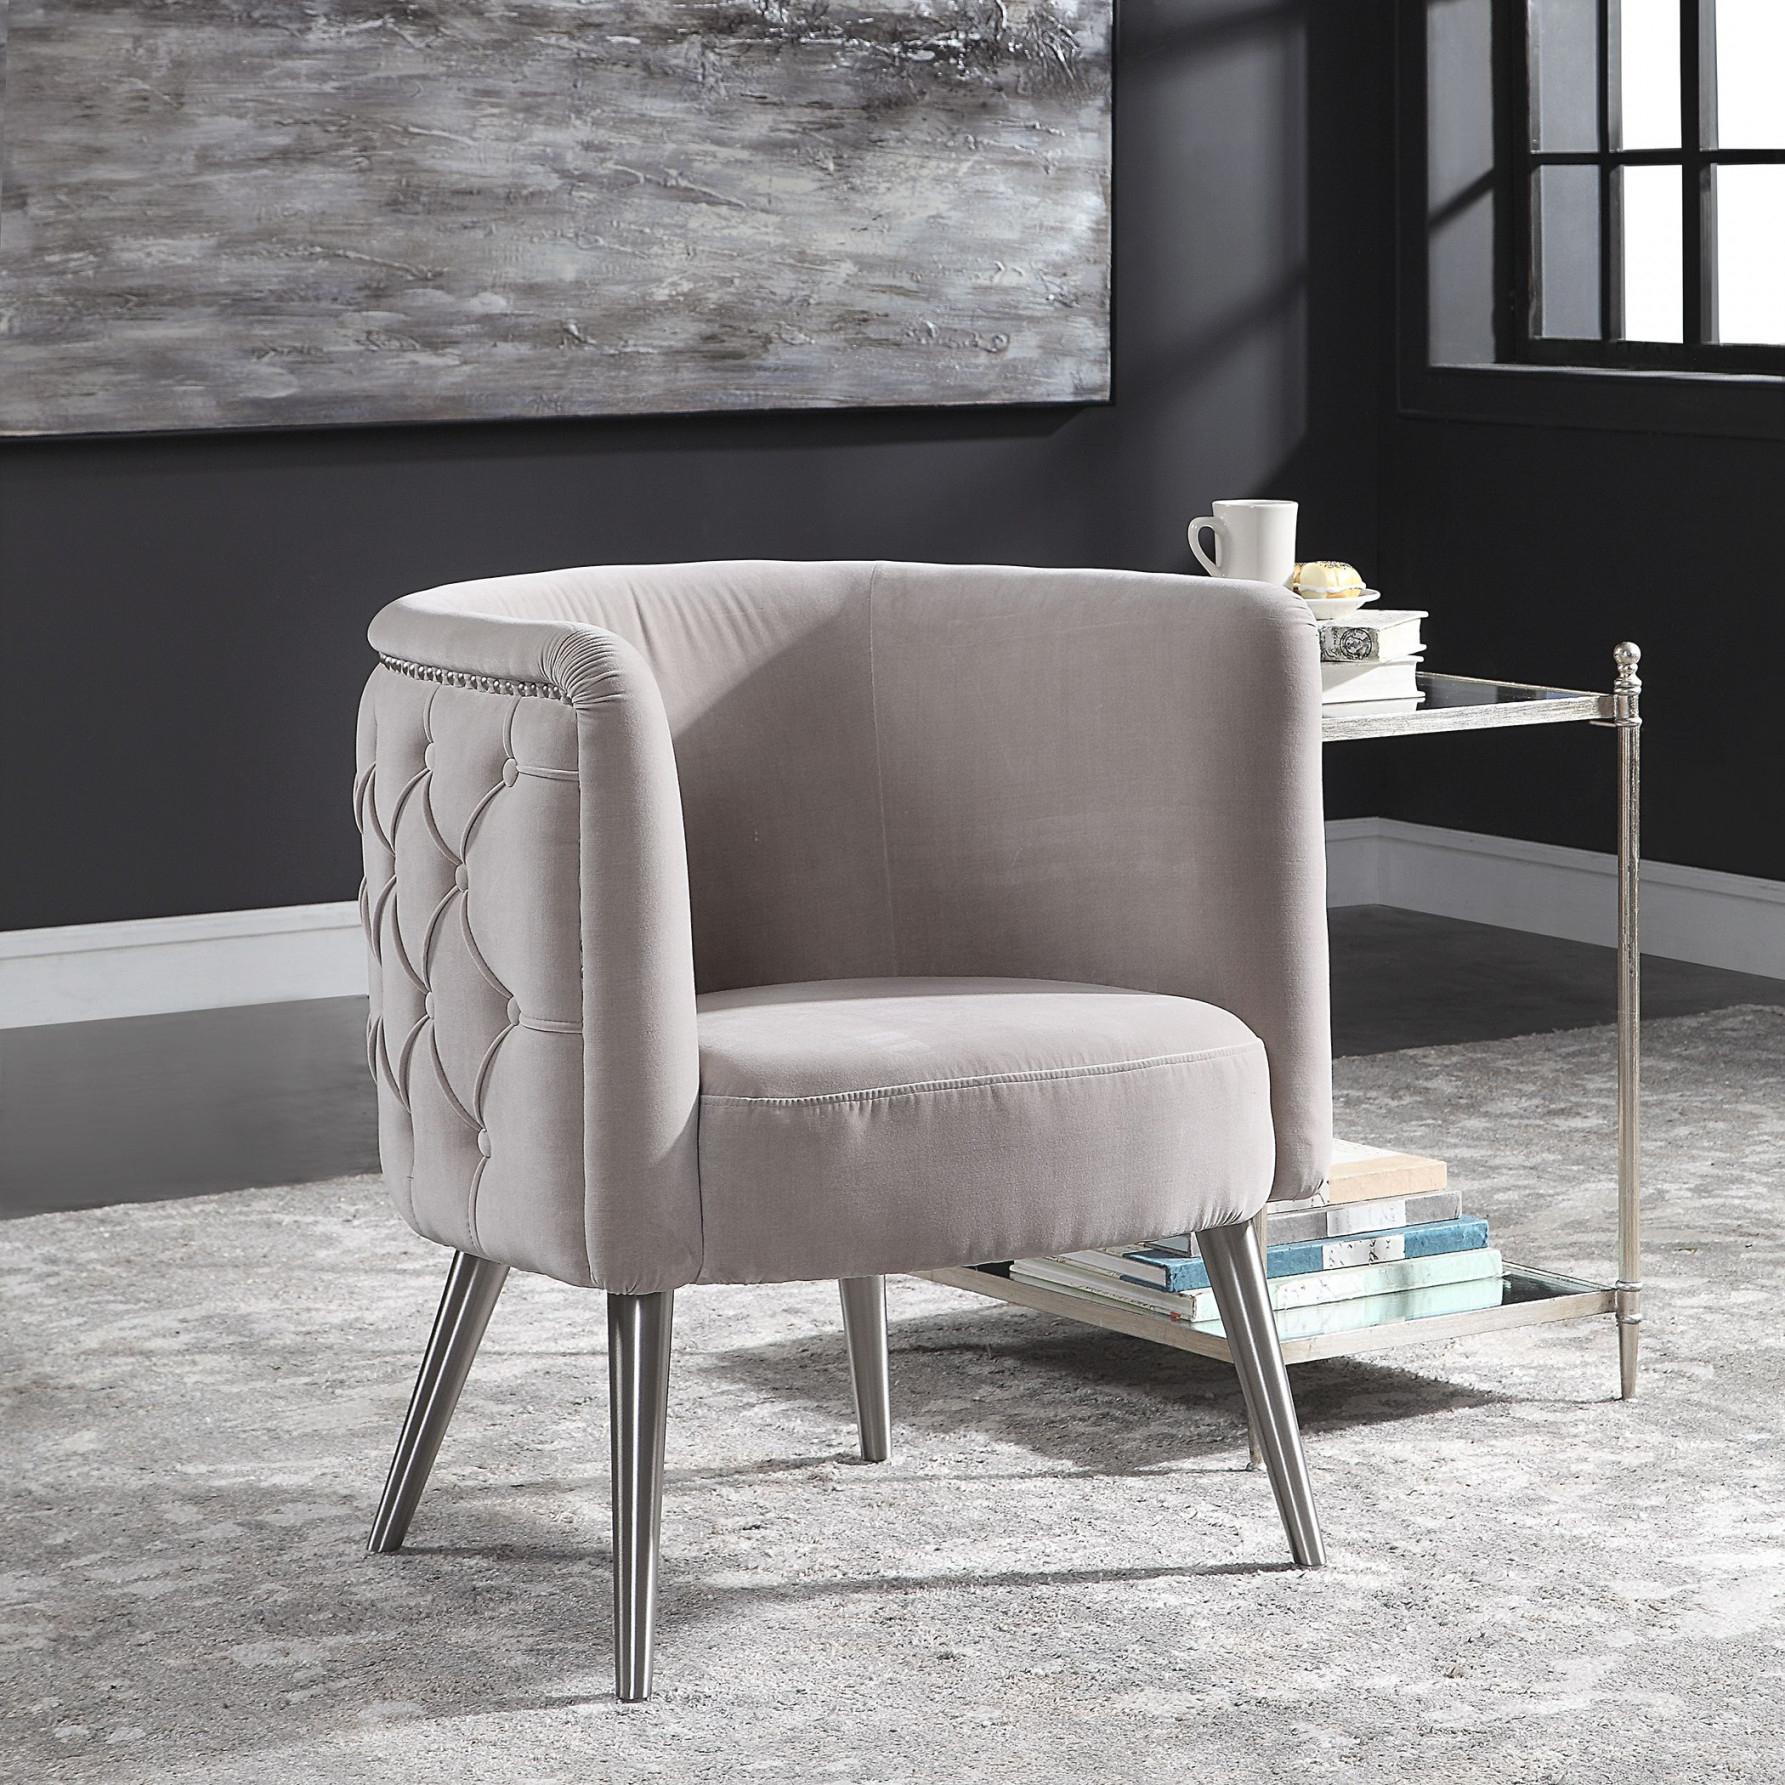 Modern Barrel Chair Bedroom Living Room Armchair Accent with Modern Chairs For Living Room